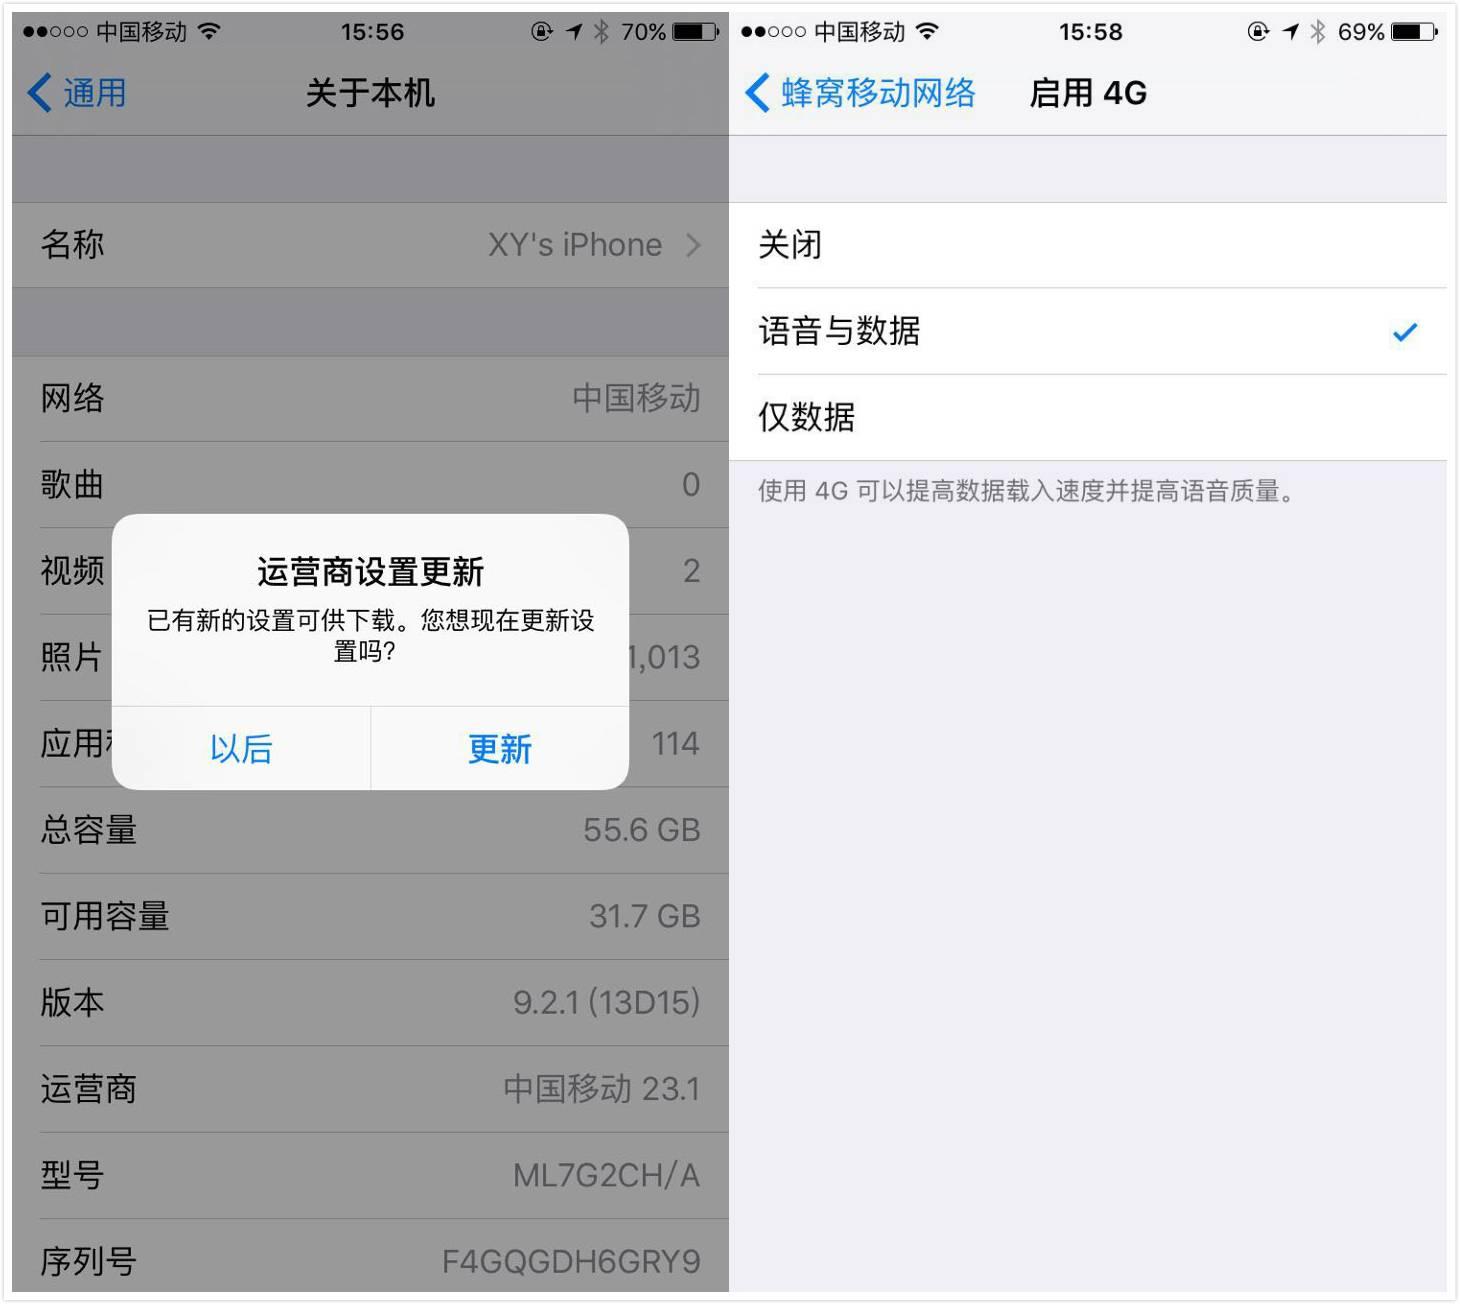 iPhone 6/6s 正式支持的 4G 高清语音通话,究竟是什么?